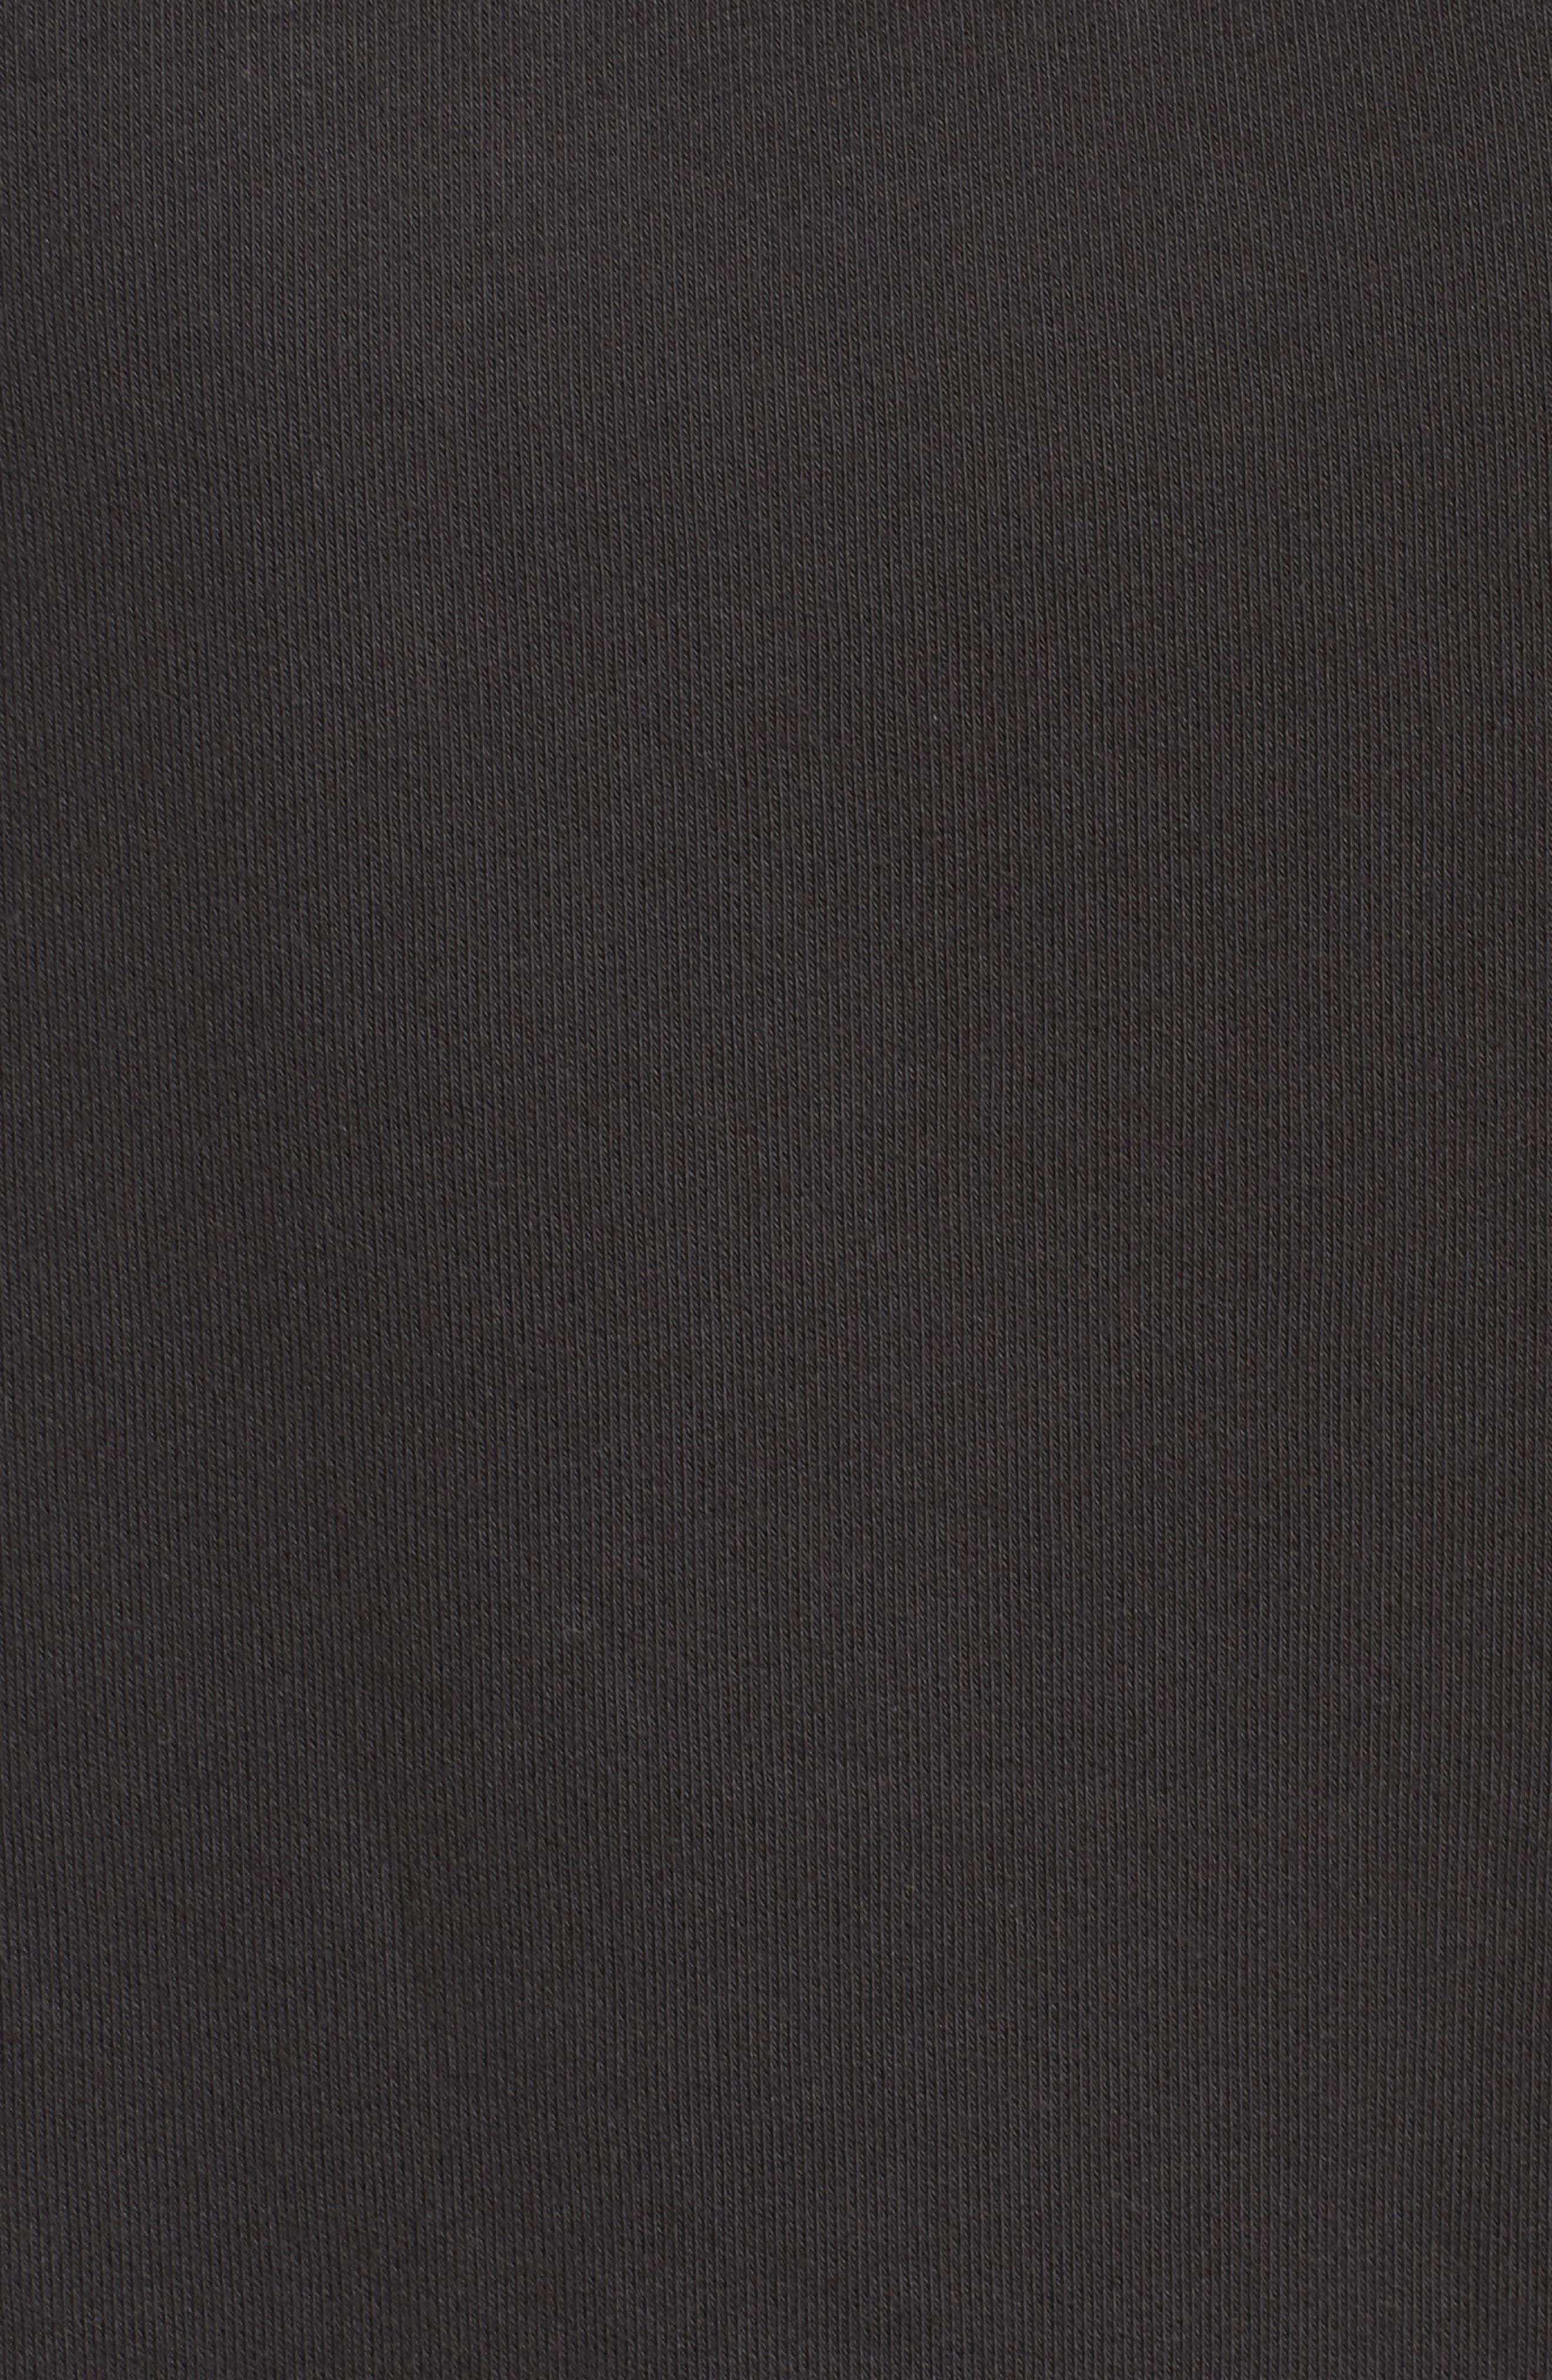 Lounge Sweatshirt,                             Alternate thumbnail 5, color,                             001